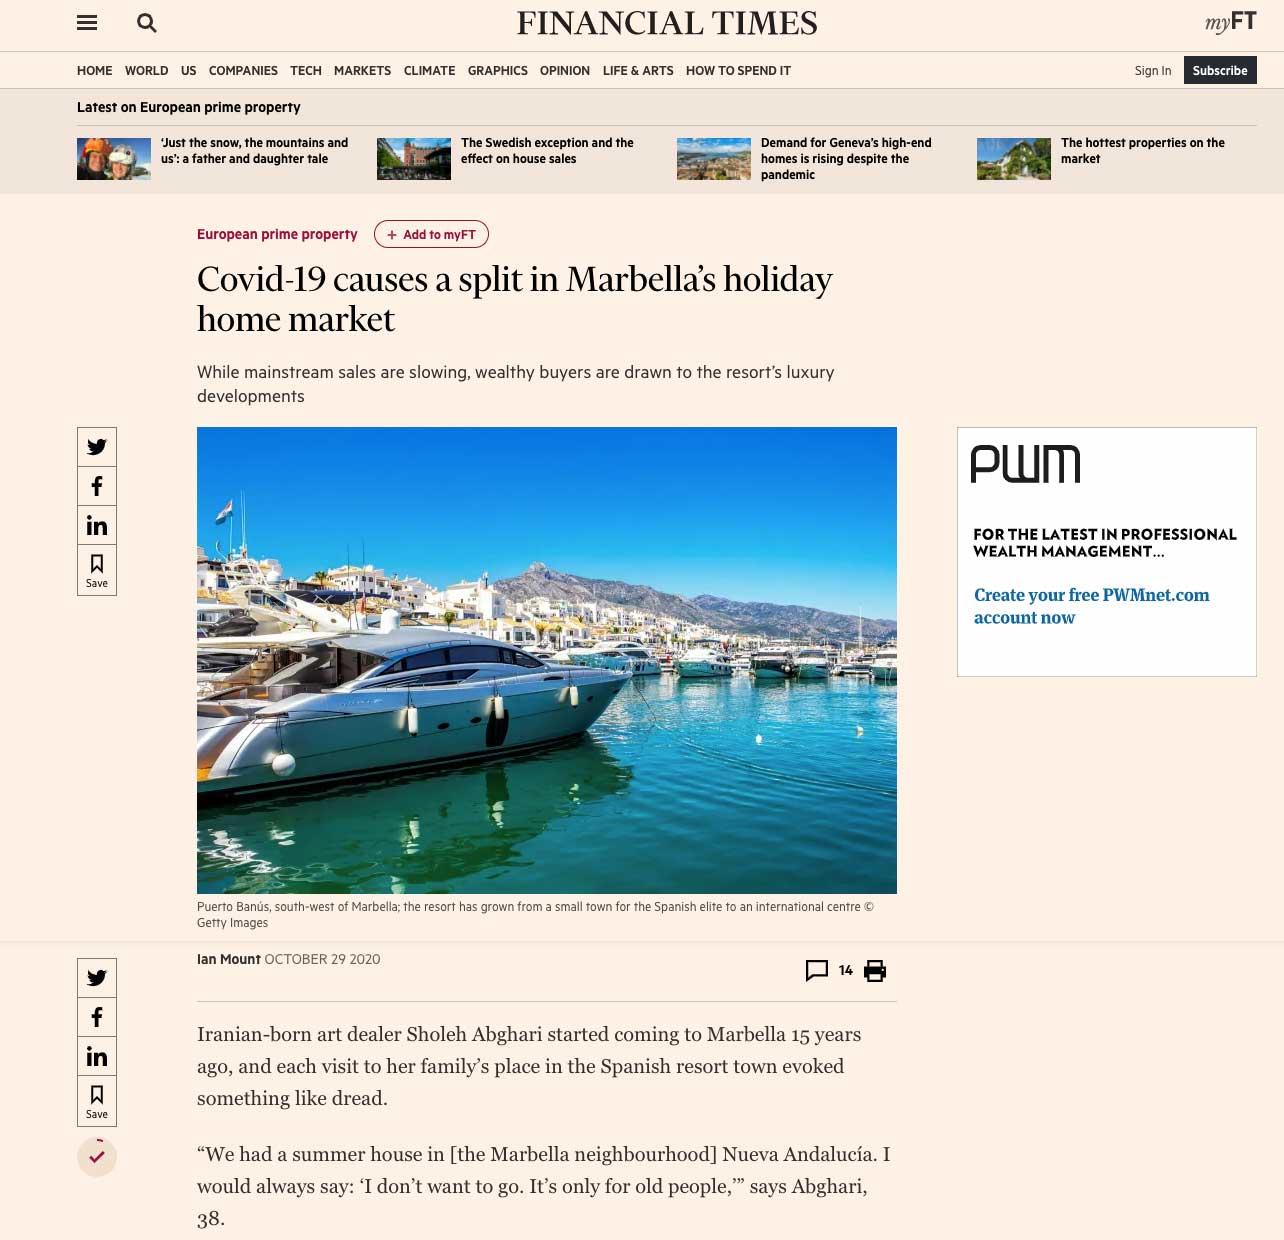 Covid-19 causes a split in Marbella's holiday home market sholeh abghari